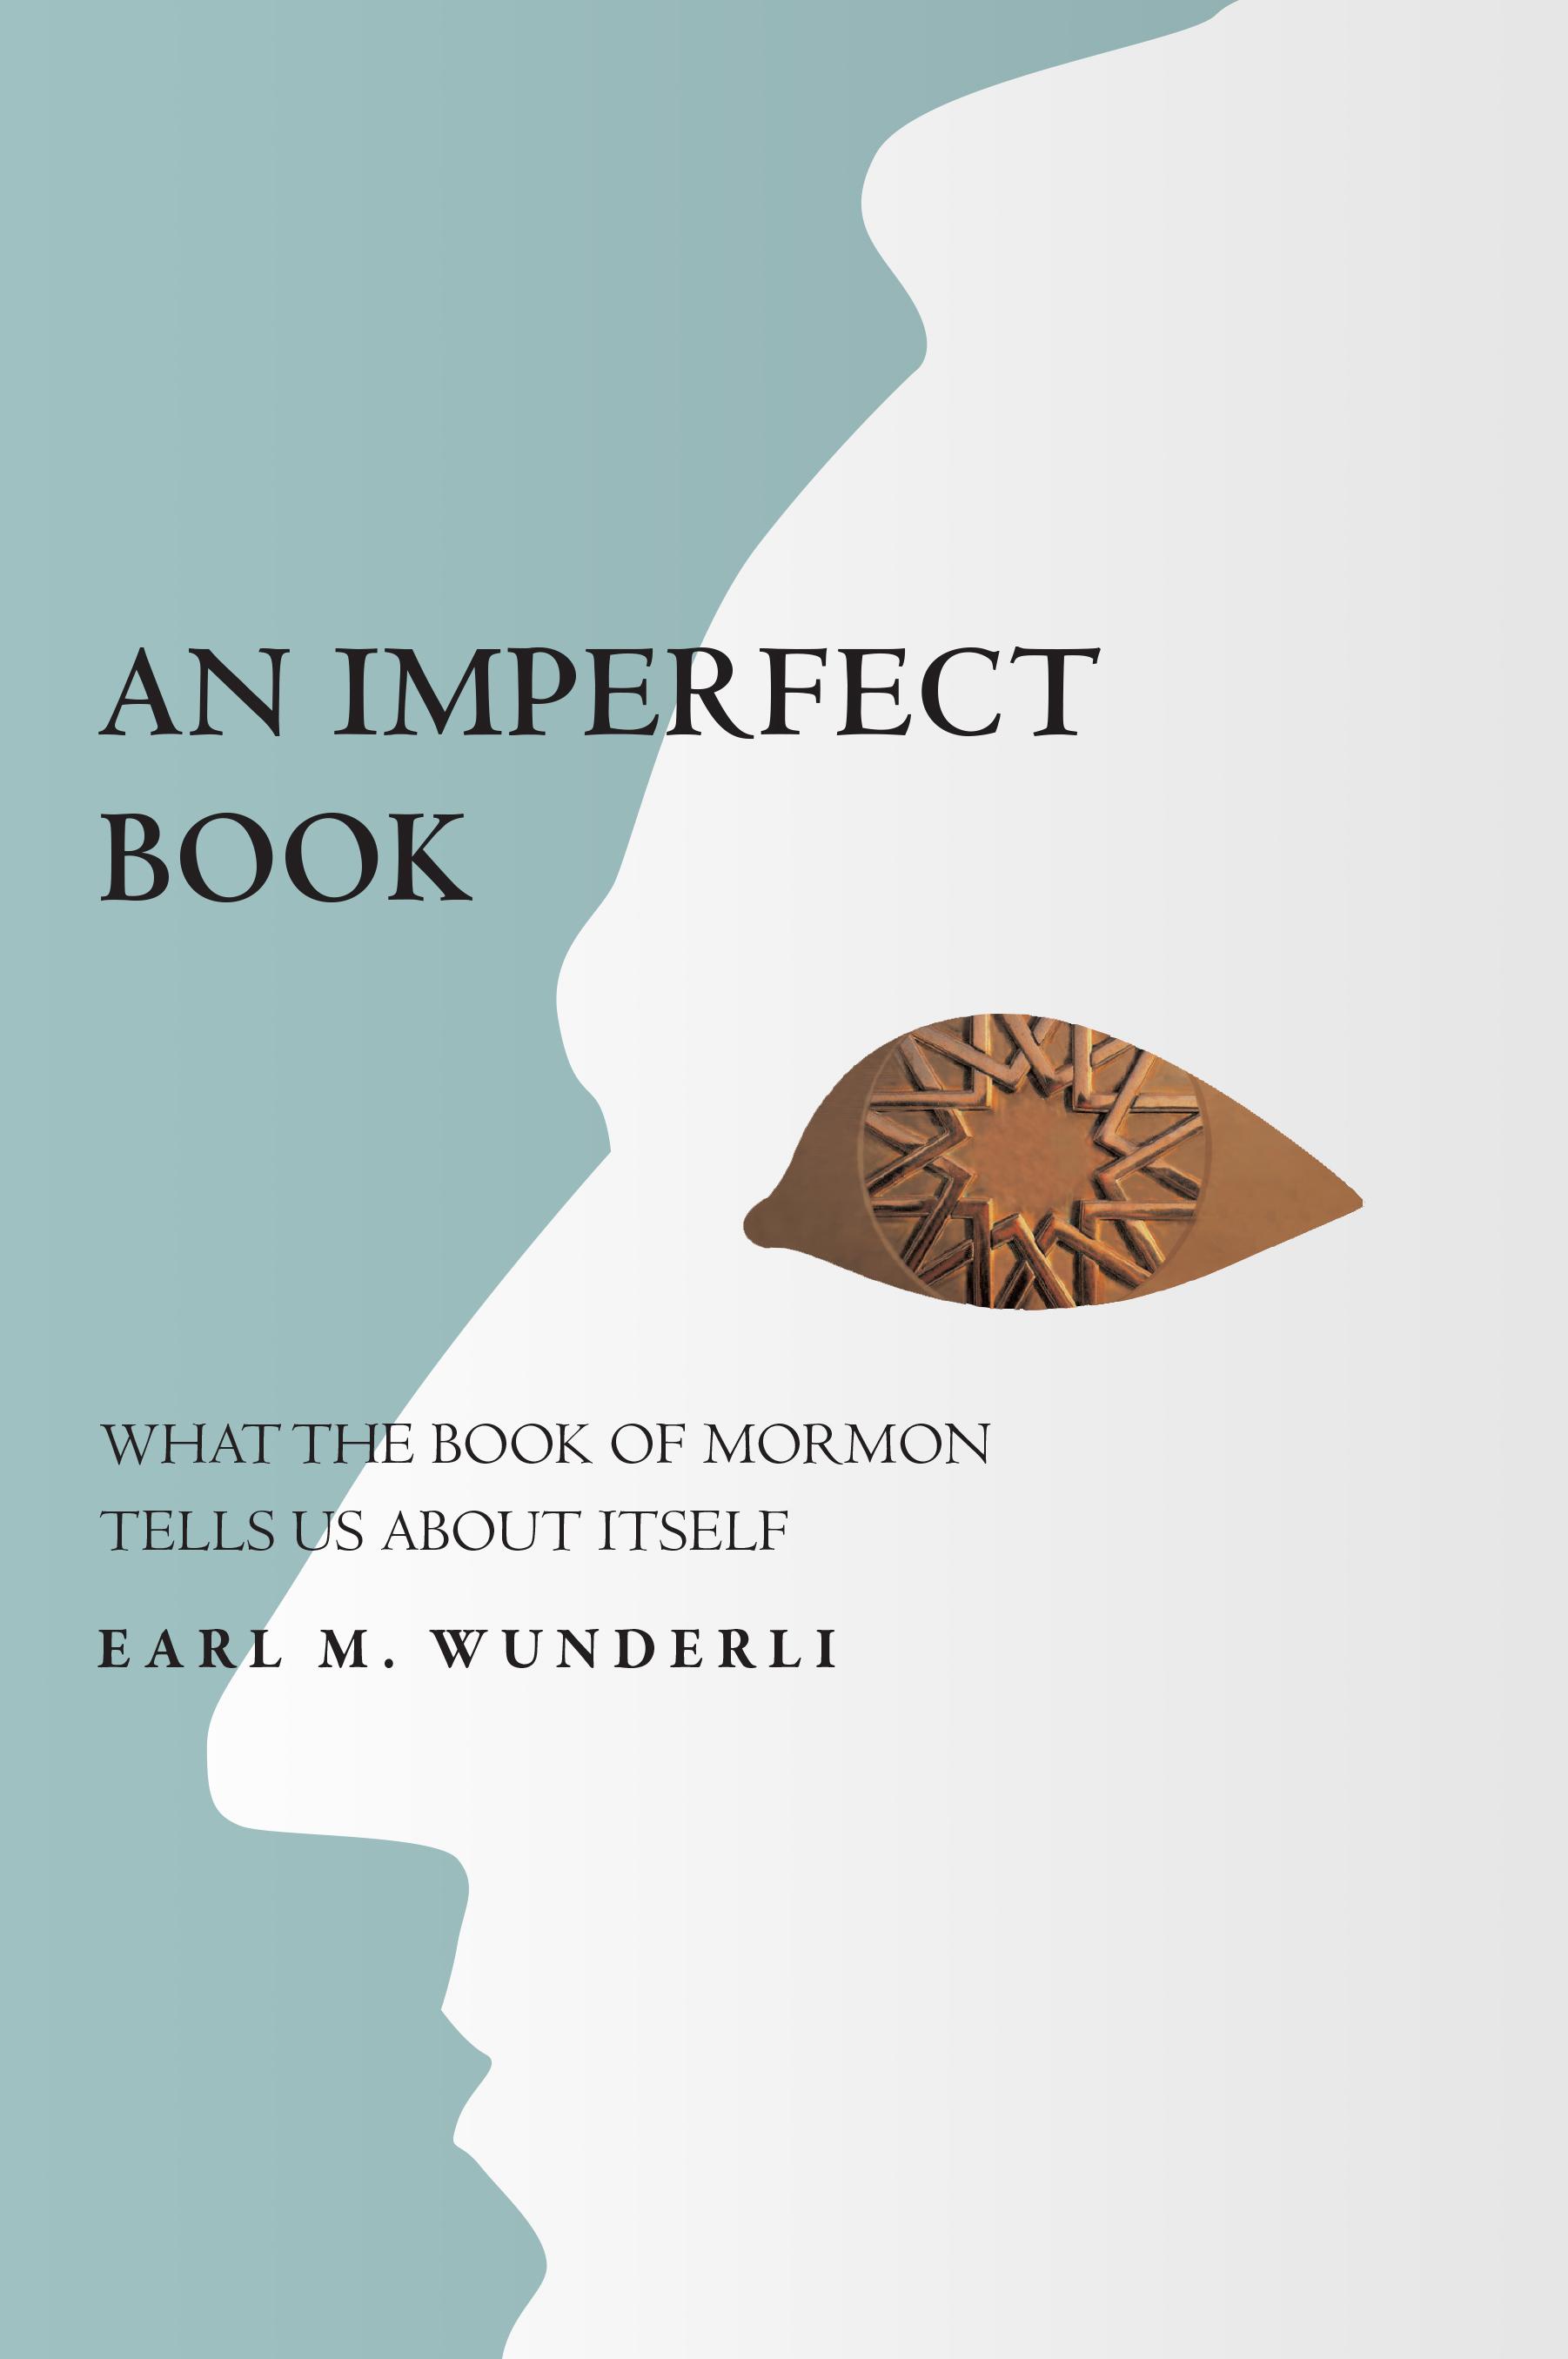 Book of Mormon on Trial: Wunderli